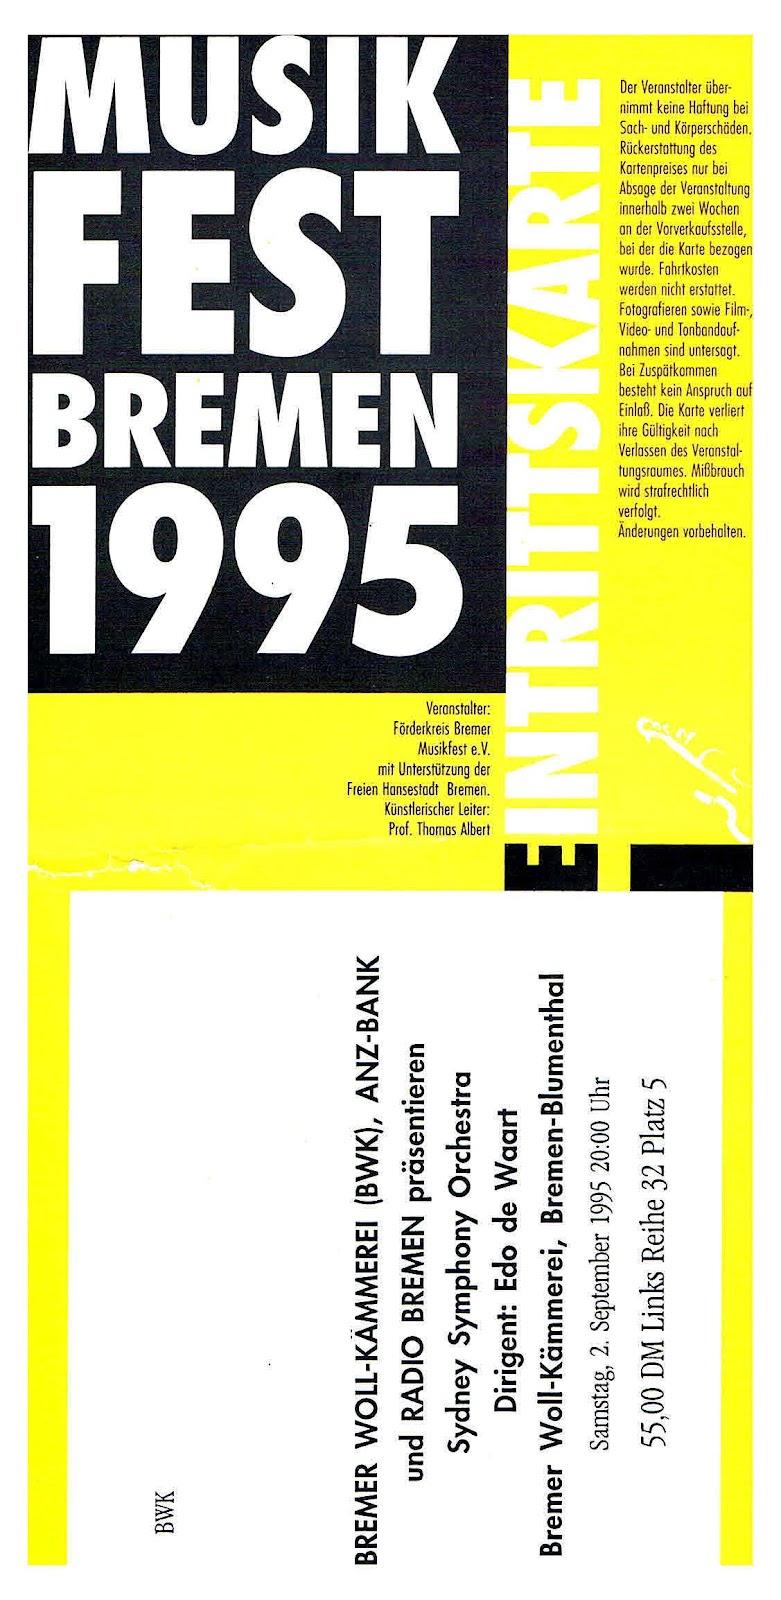 G:\A Kämmerei Verein\a Verlassene Räume\Musikfest 1995\Eintrittskarte Musikfest Bremen 1995.jpg